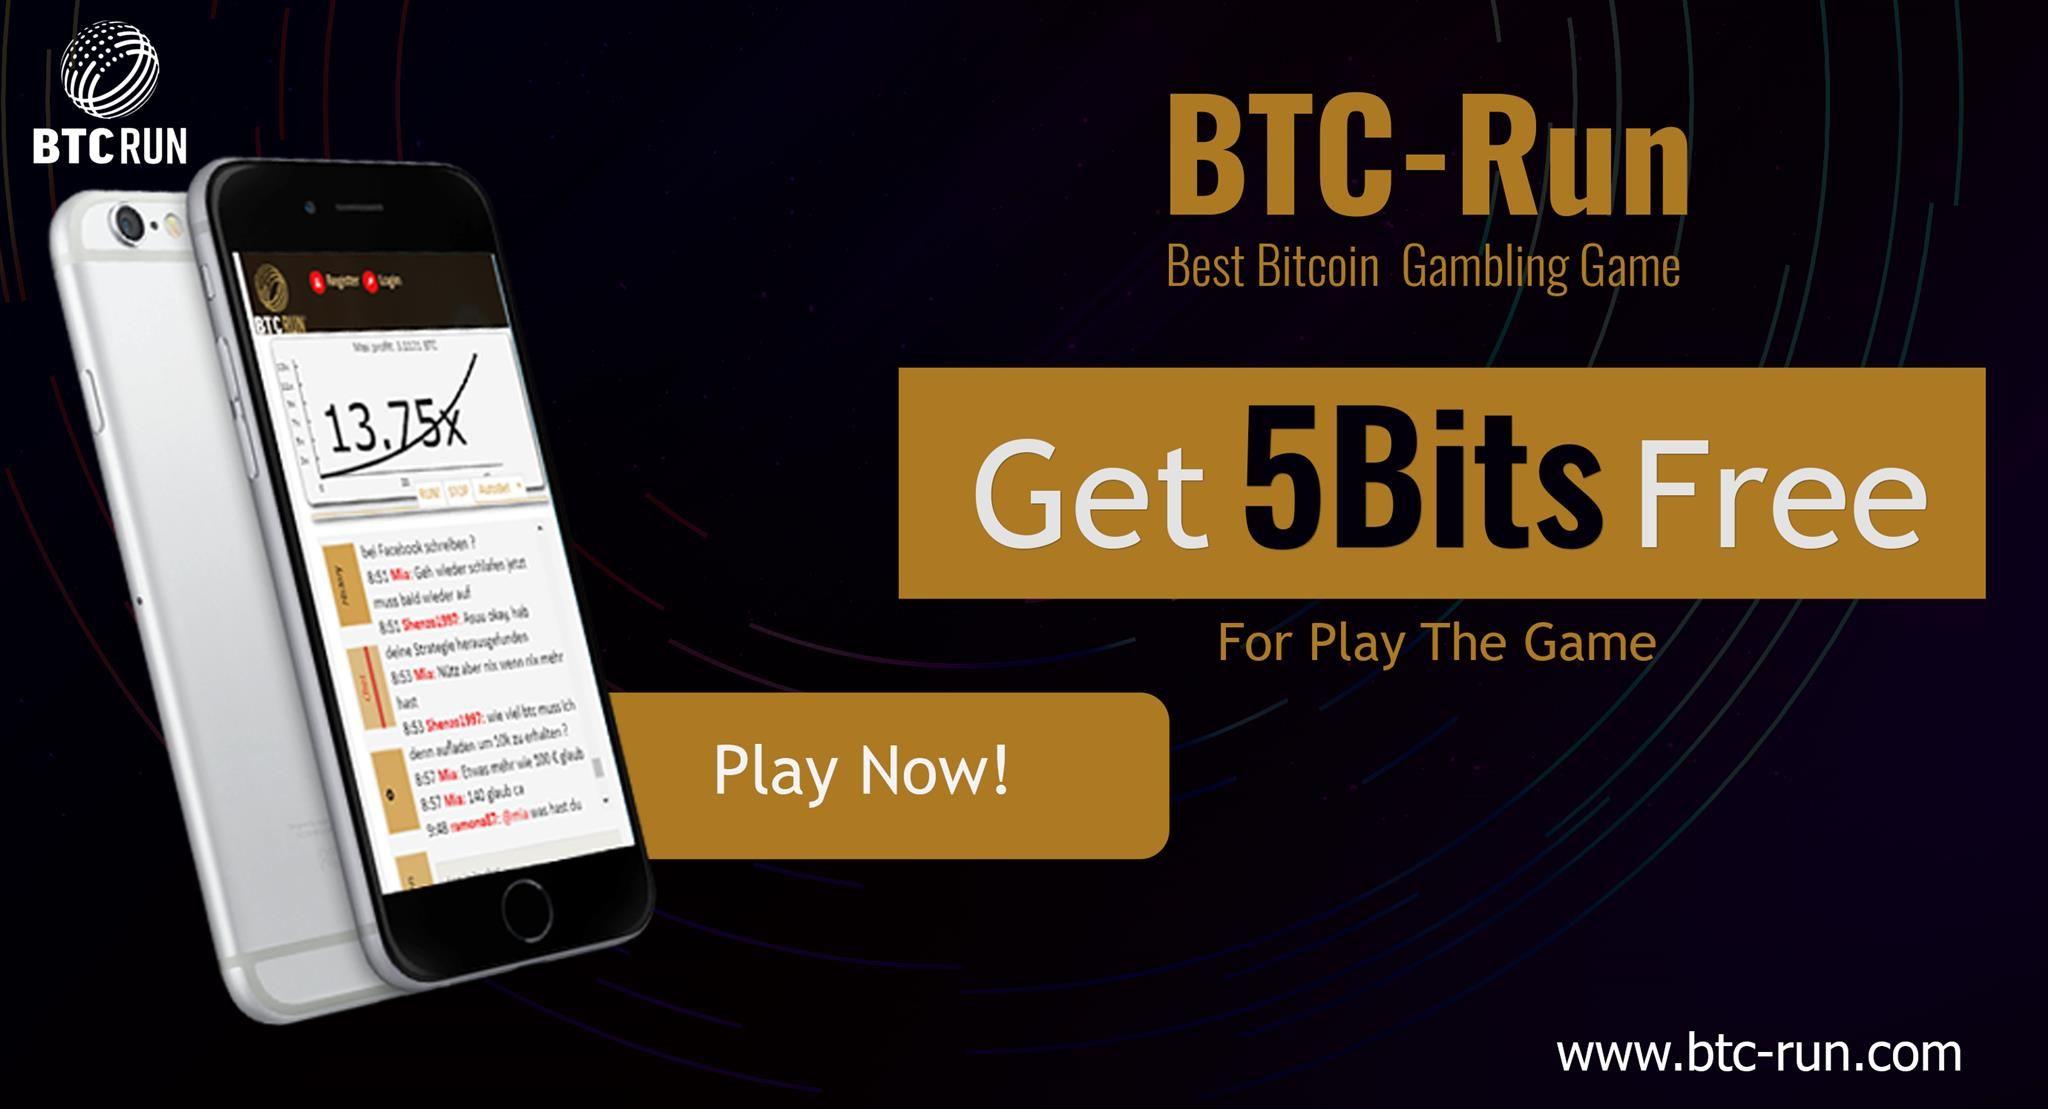 Deposit to get Free Bitcoins as Bonus! Free, How to get